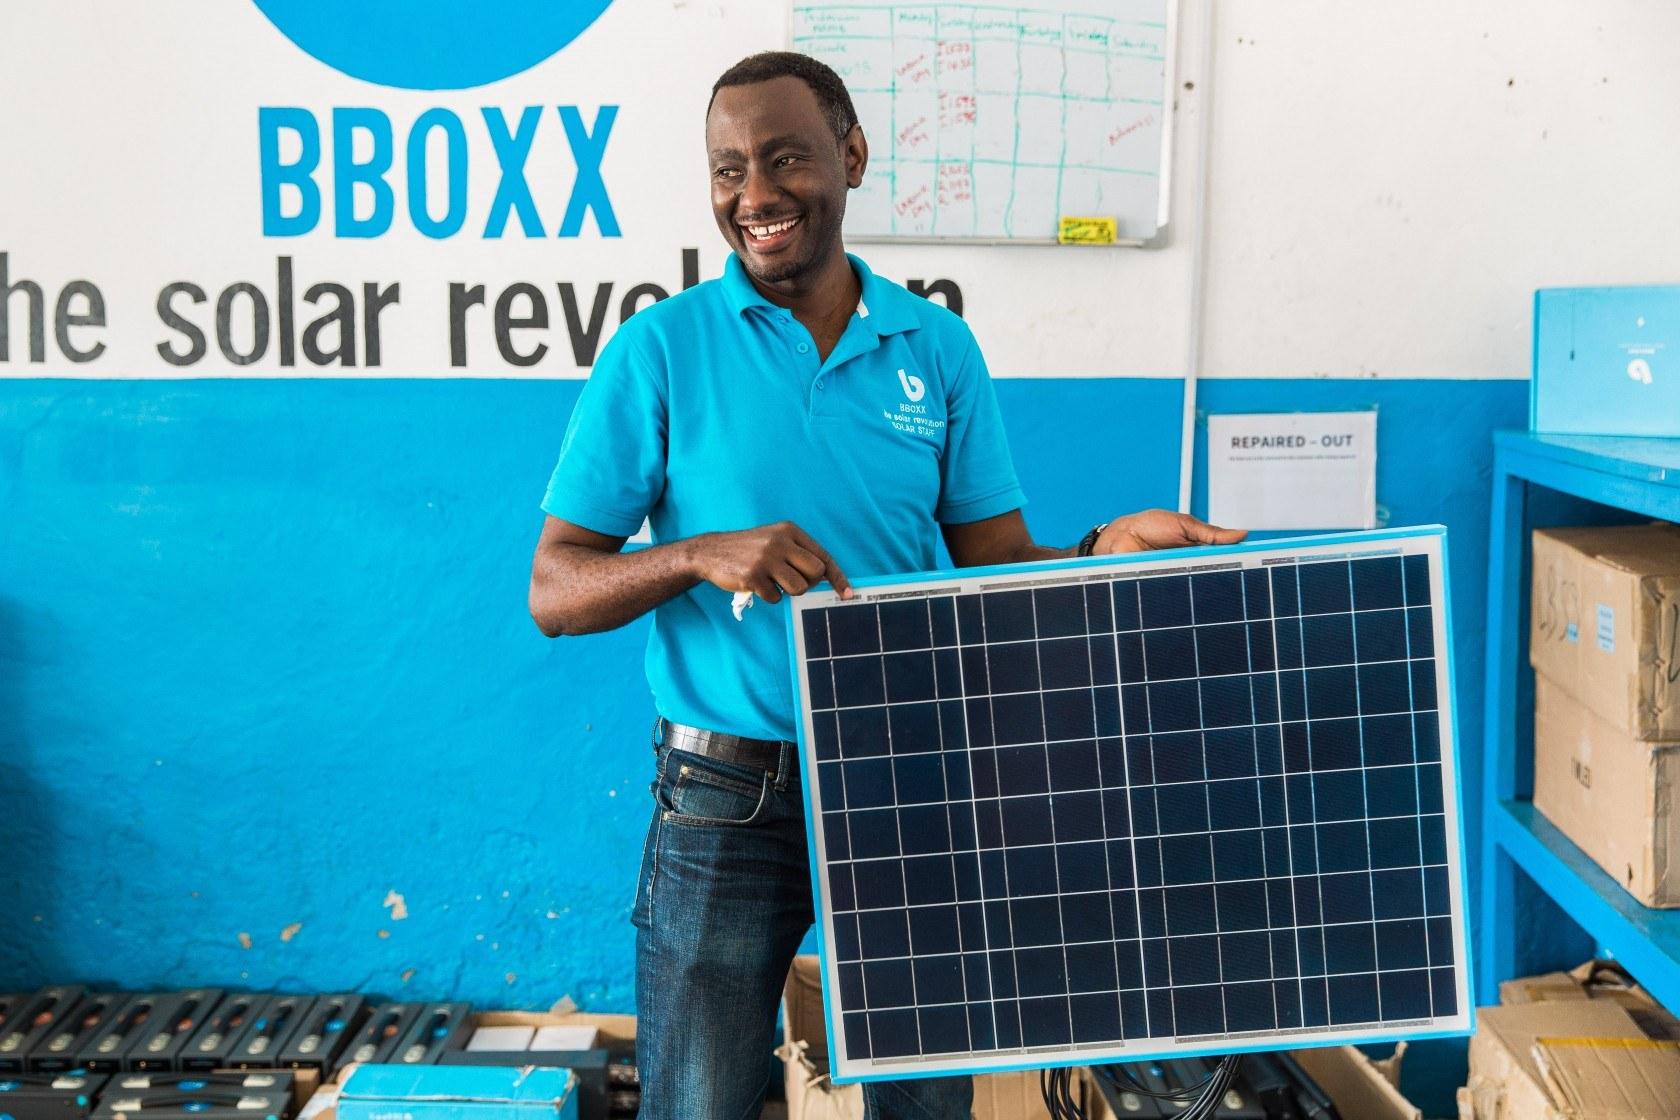 BBOXX employee holding solar panel